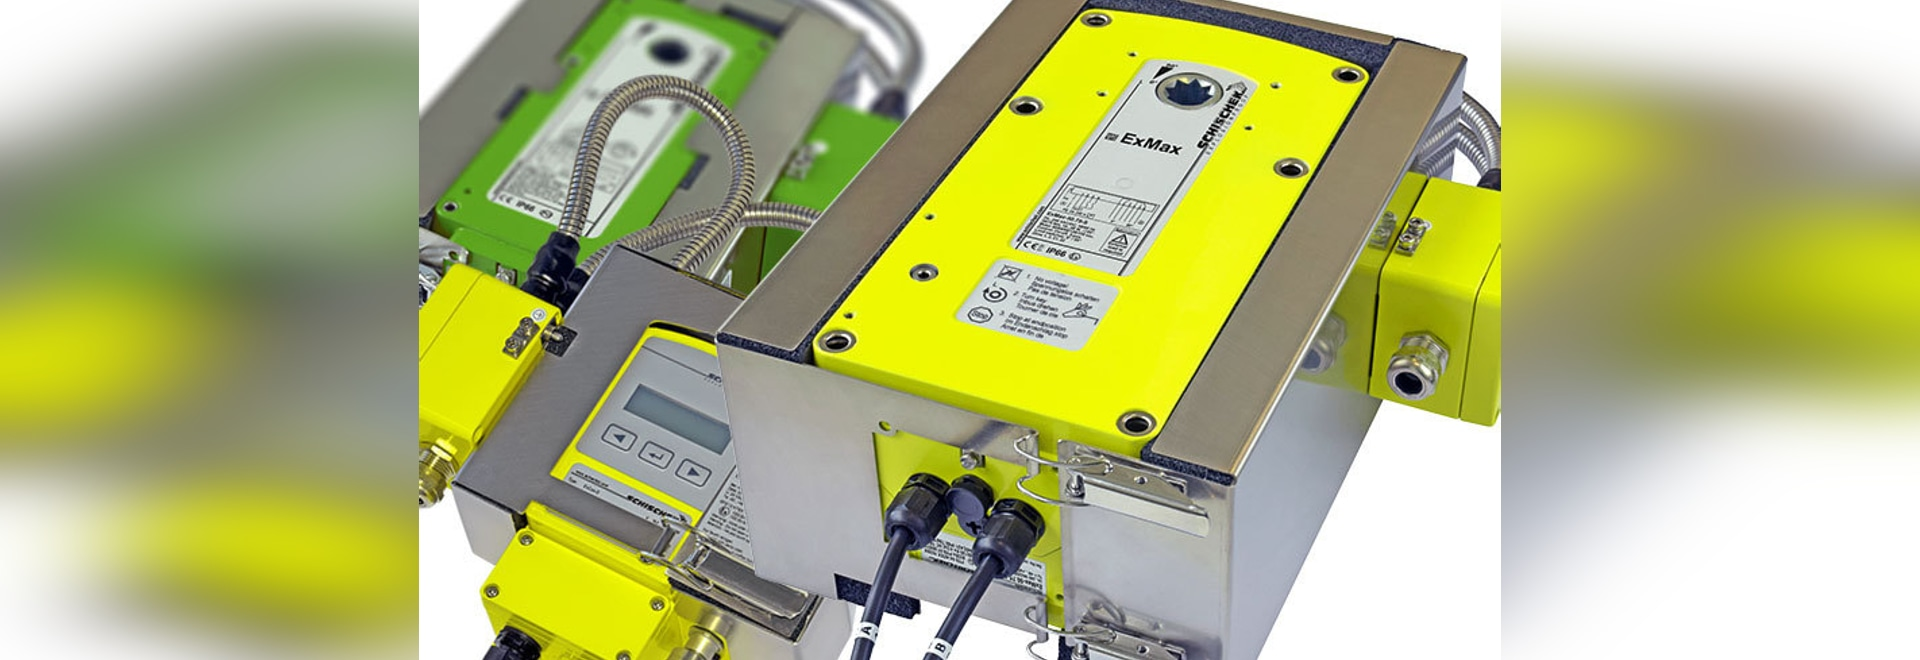 Retrofit heating system ExPolar/InPolar for Schischek actuators and sensors